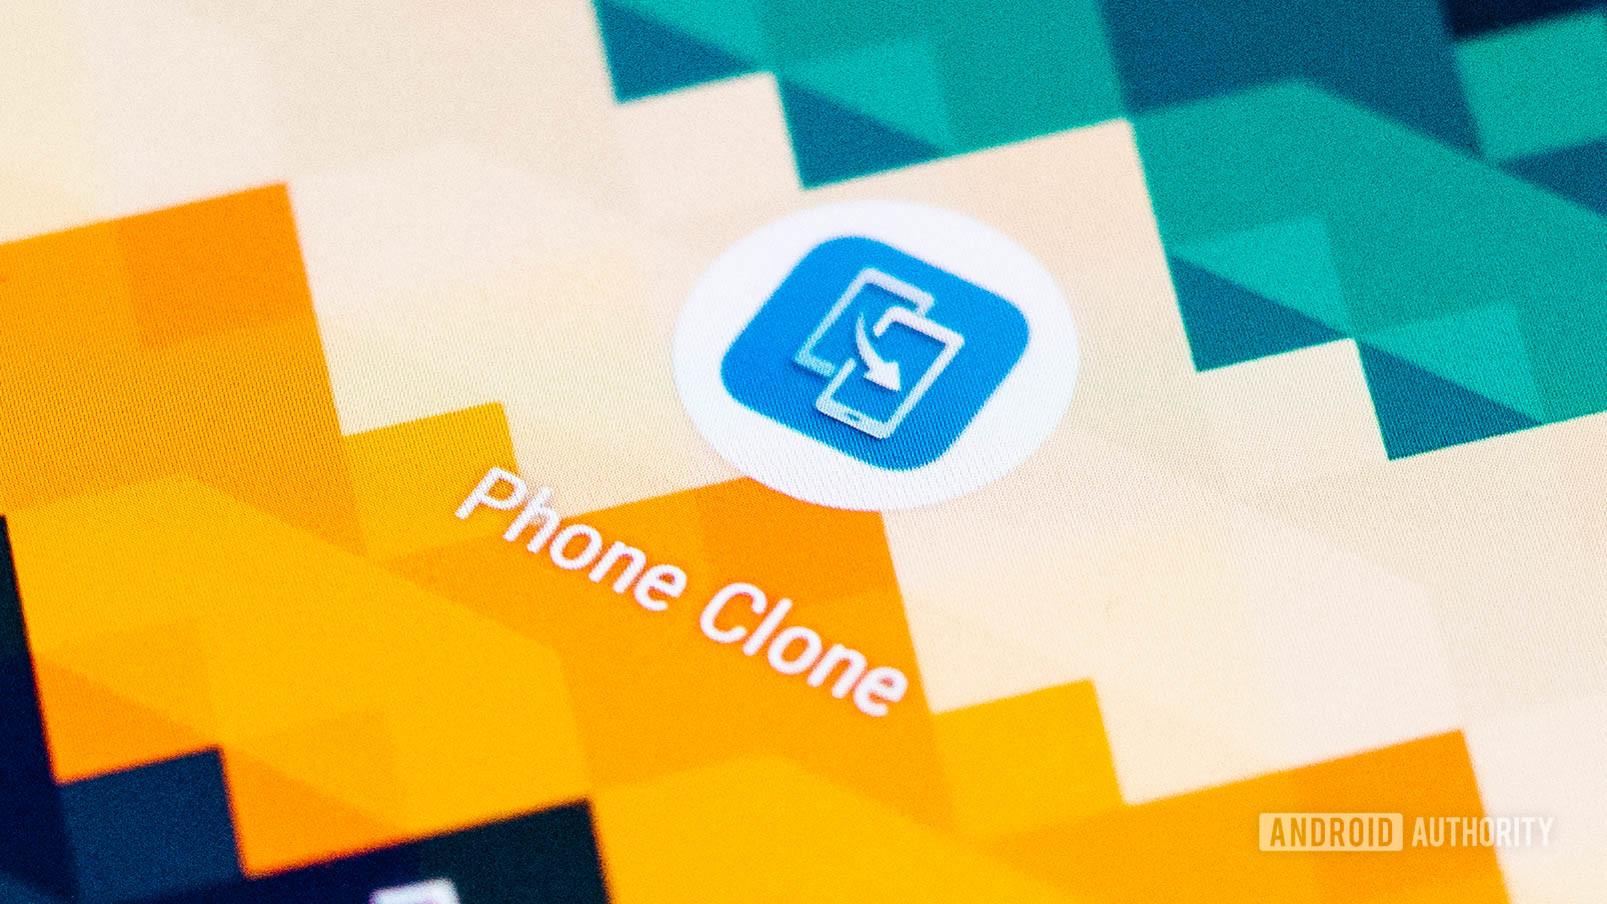 OnePlus Home screen